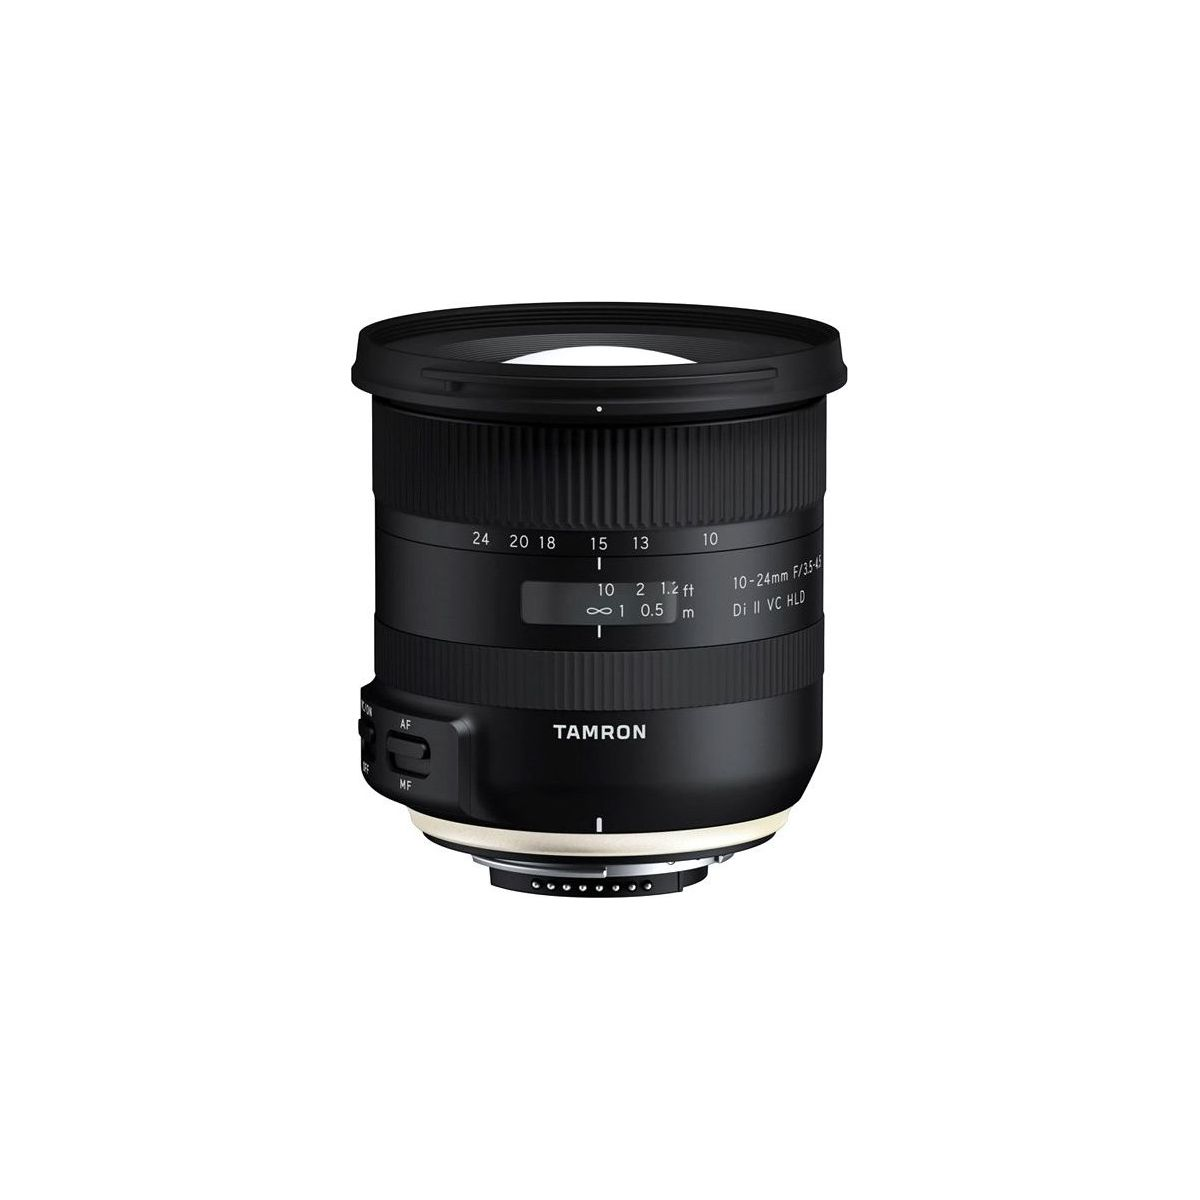 Obj TAMRON 10-24mm f/3.5-4.5 Di II VC HLD Nikon